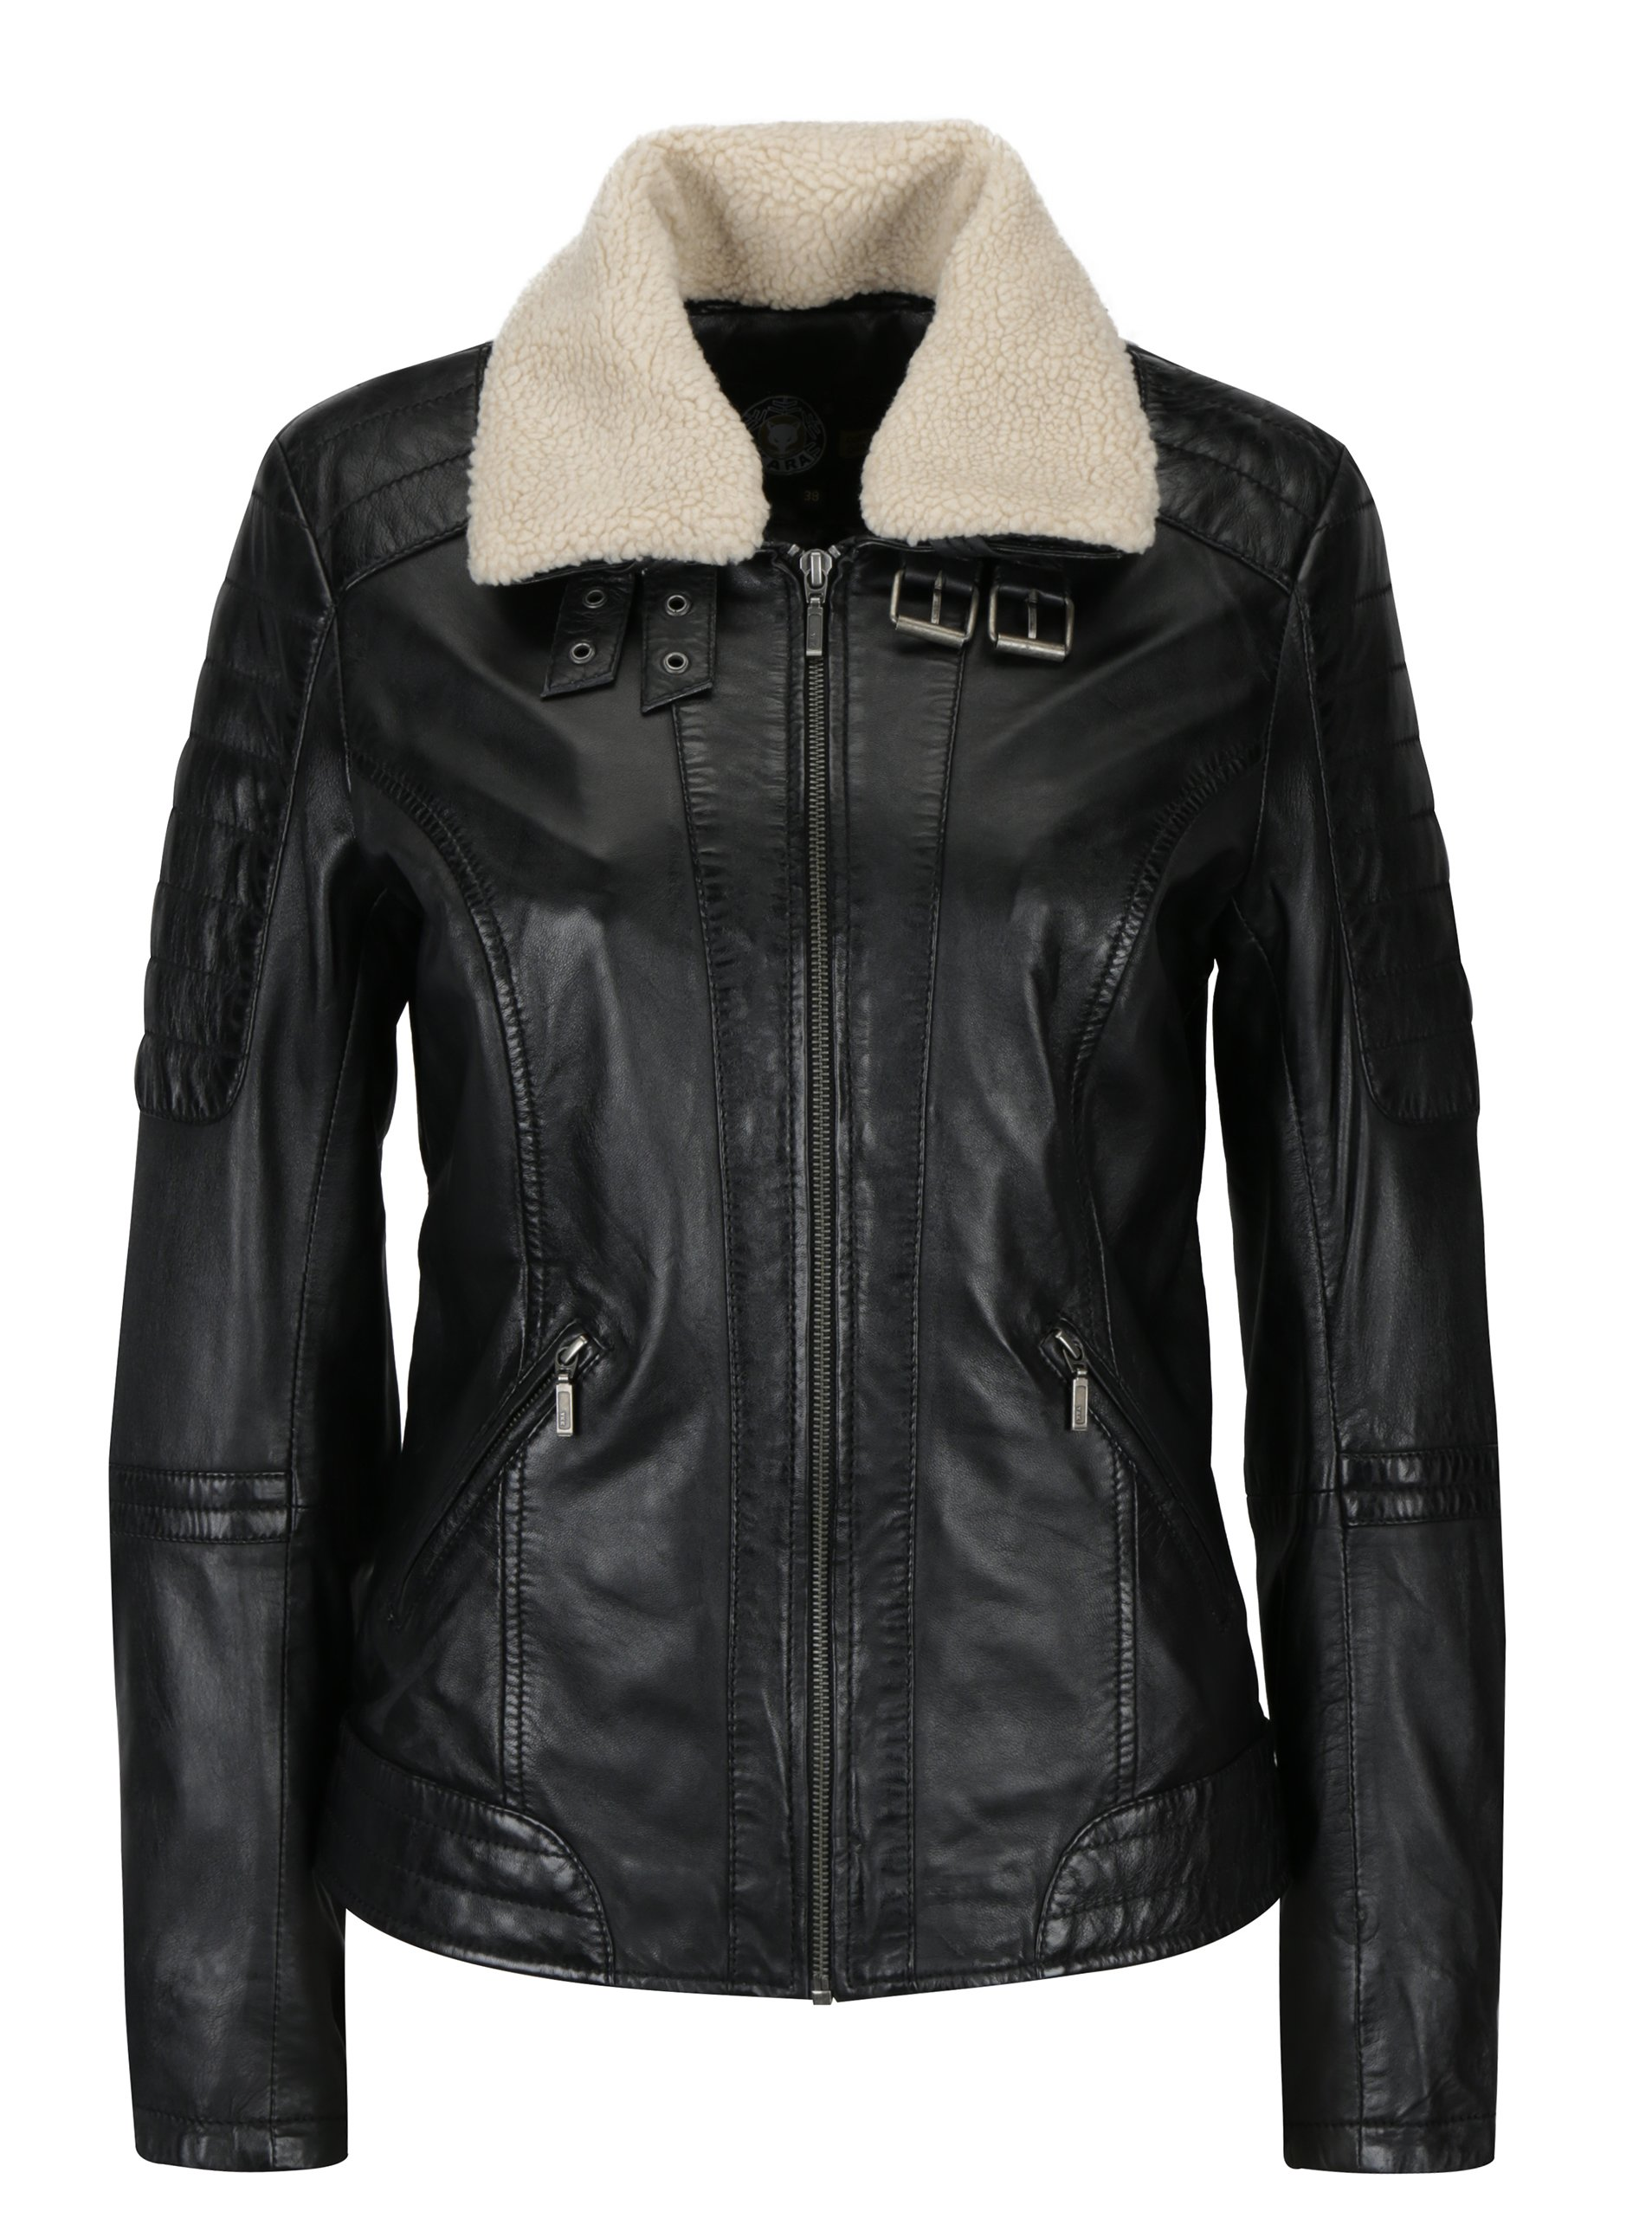 Černá dámská kožená bunda s umělou kožešinou KARA Hanna